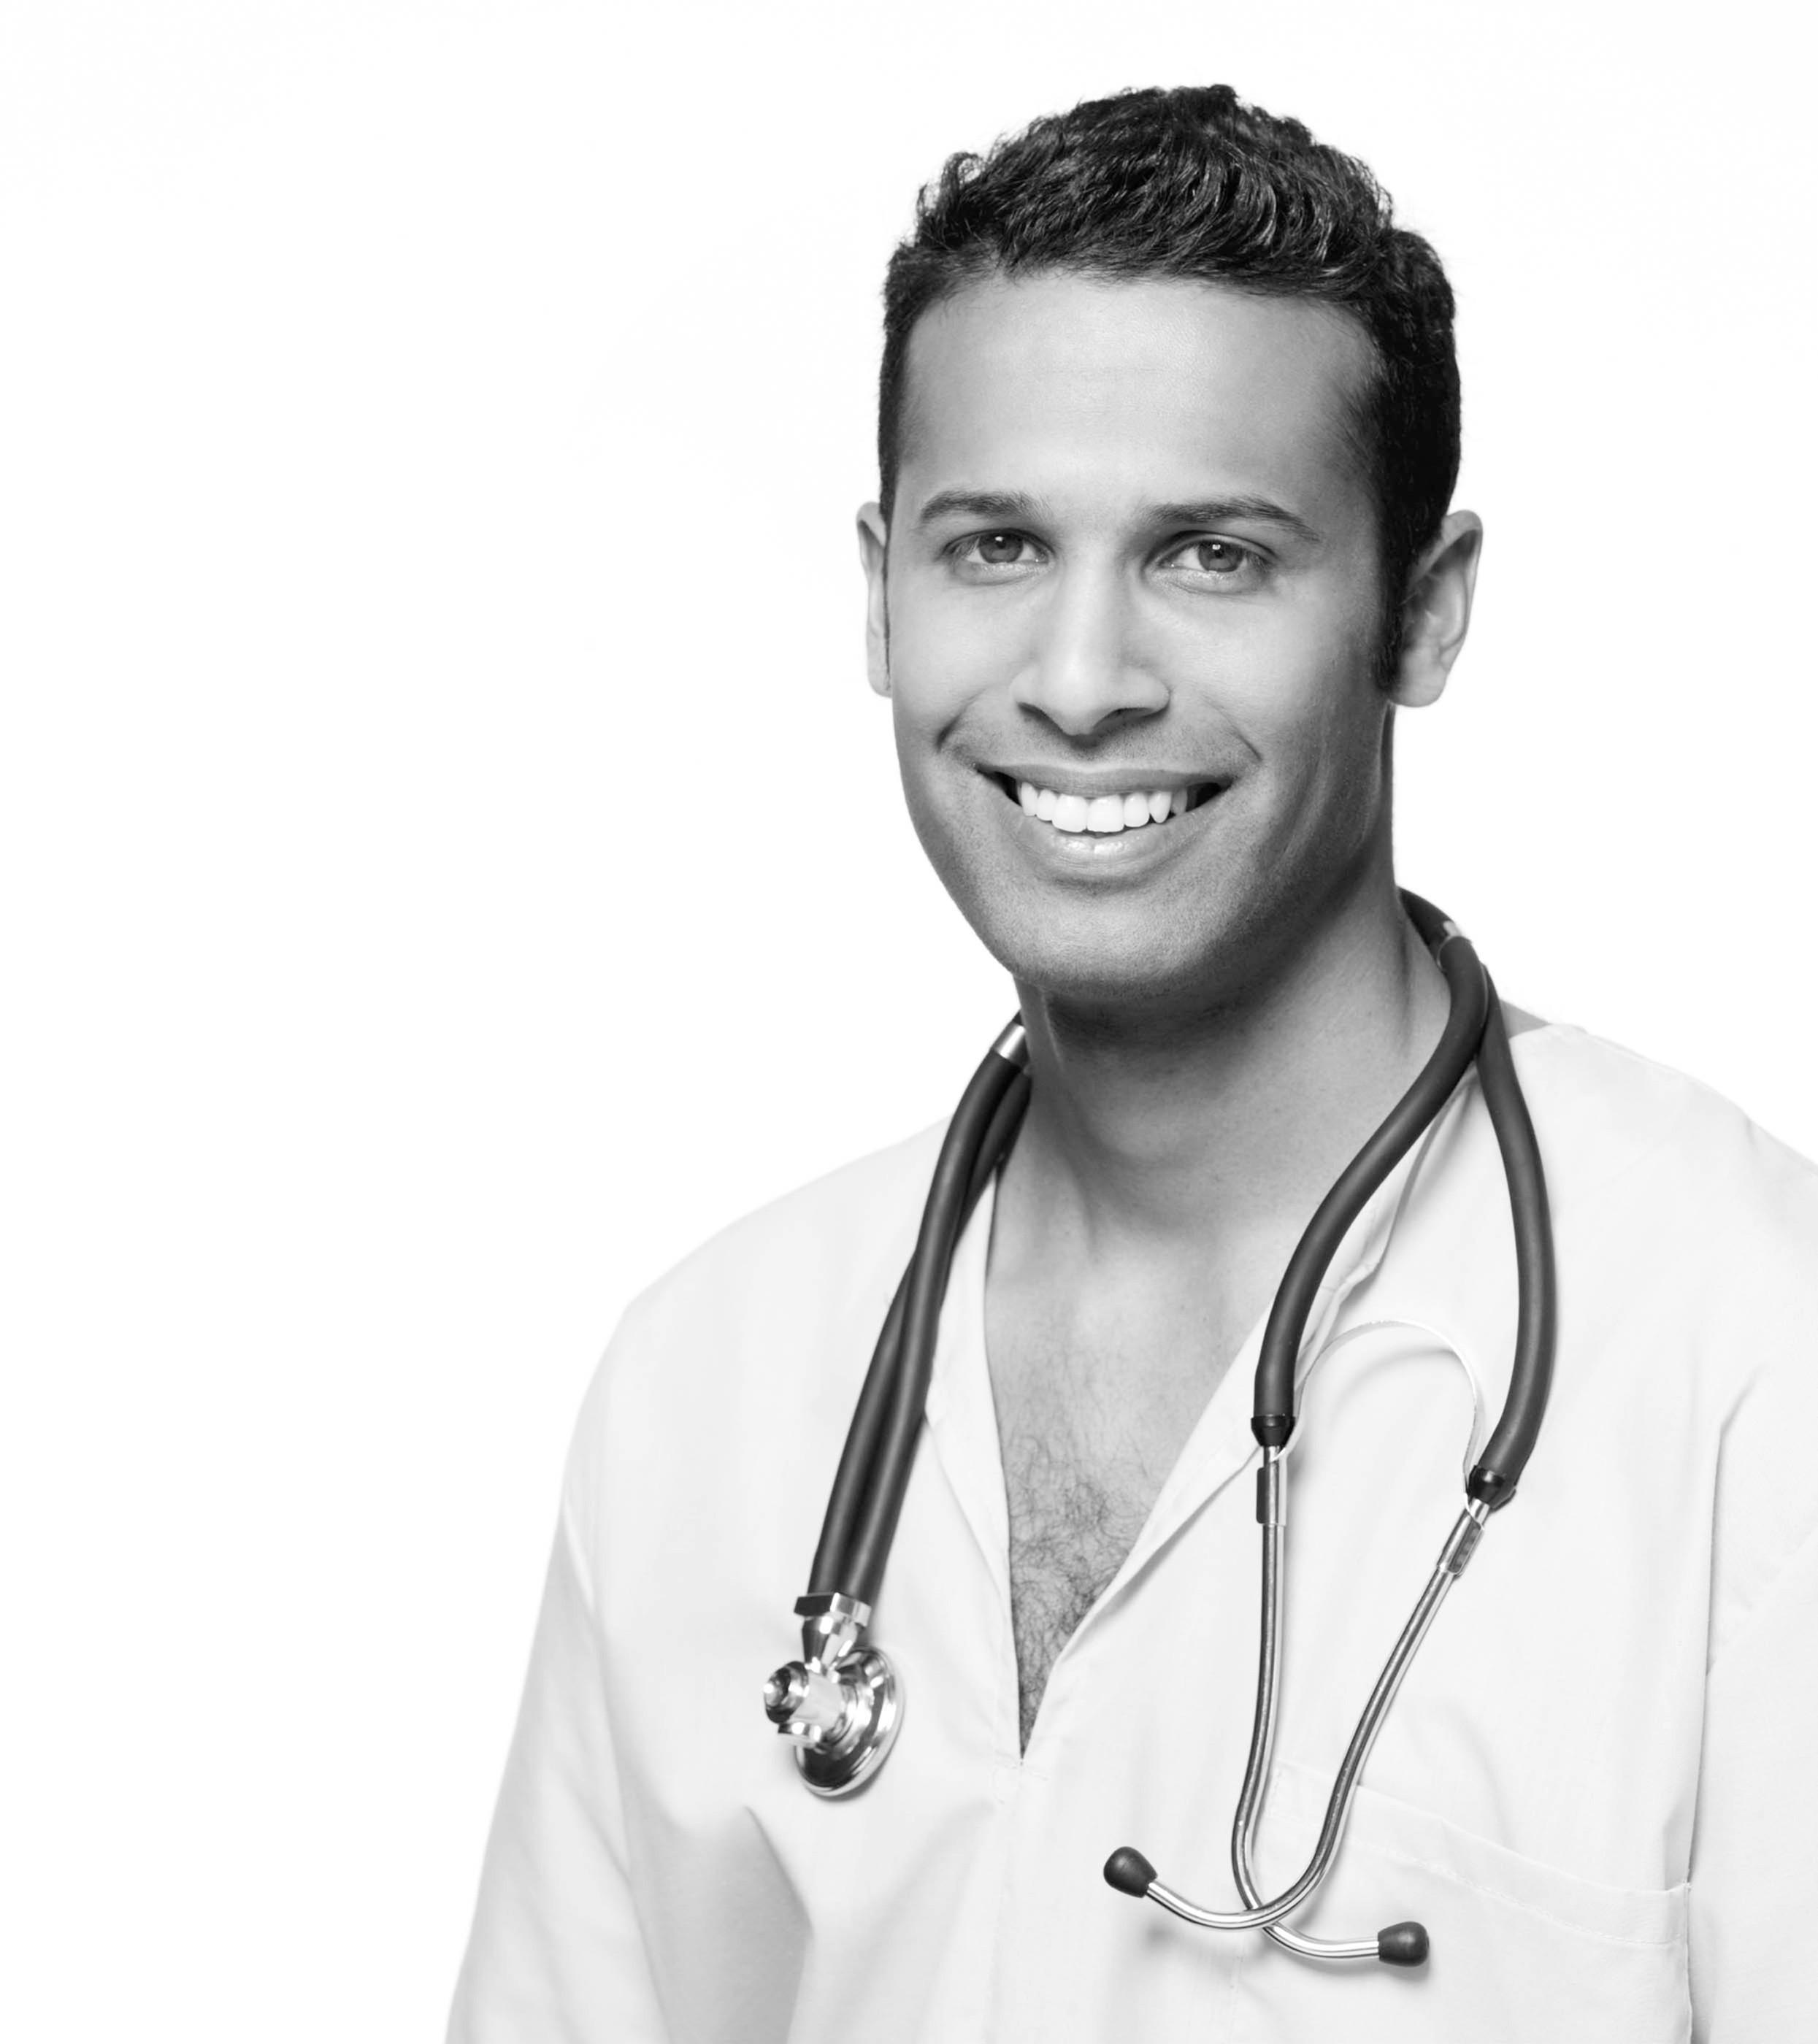 Tratamiento de VIH - HIV Treatment